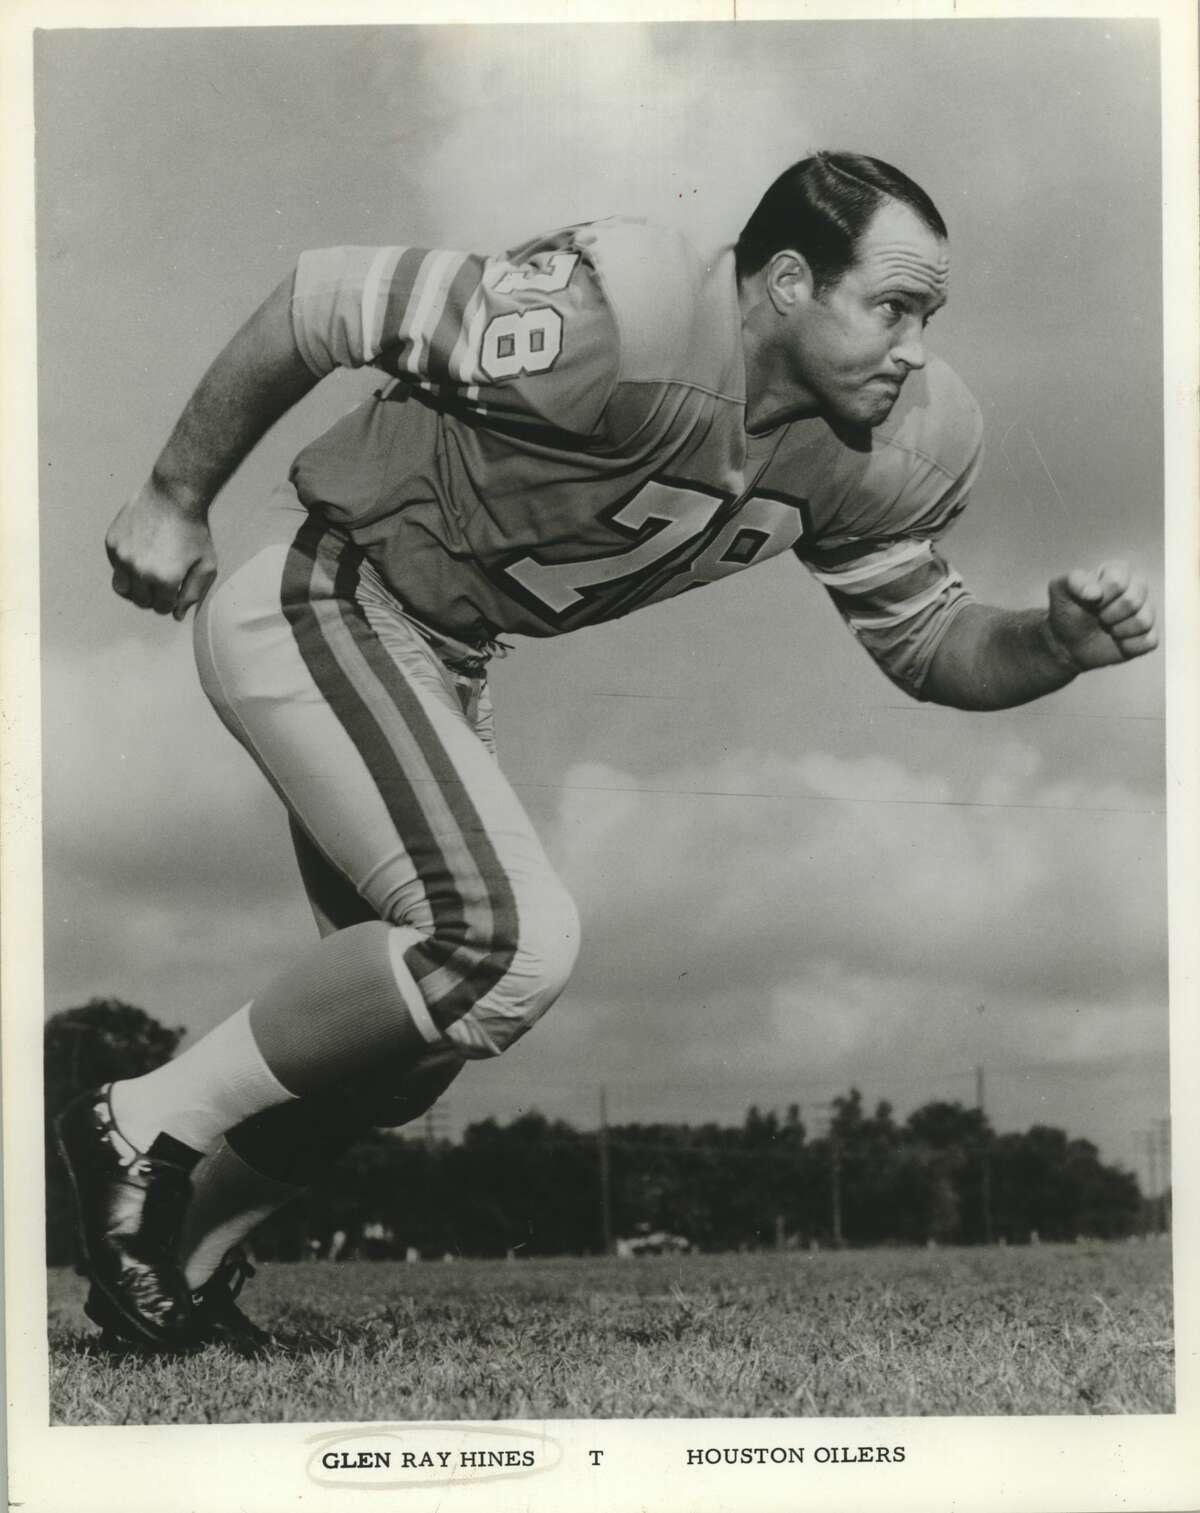 Feb. 1:Glen Ray Hines, 75, former Oilers lineman